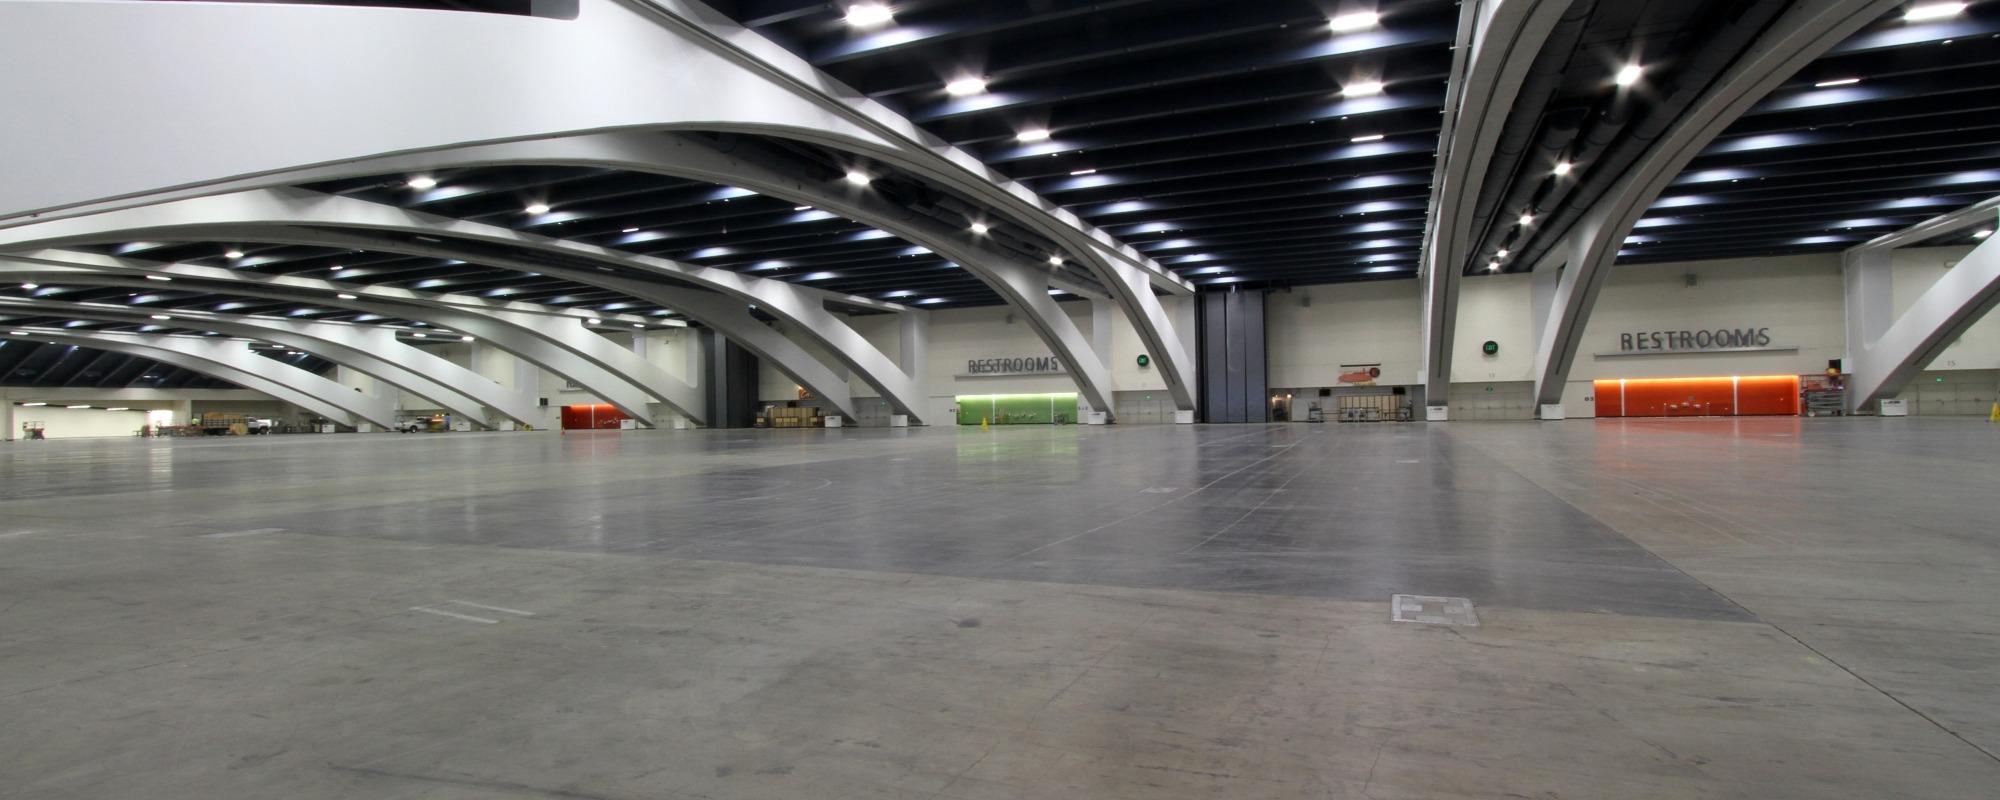 Moscone Center Capital Improvement Program